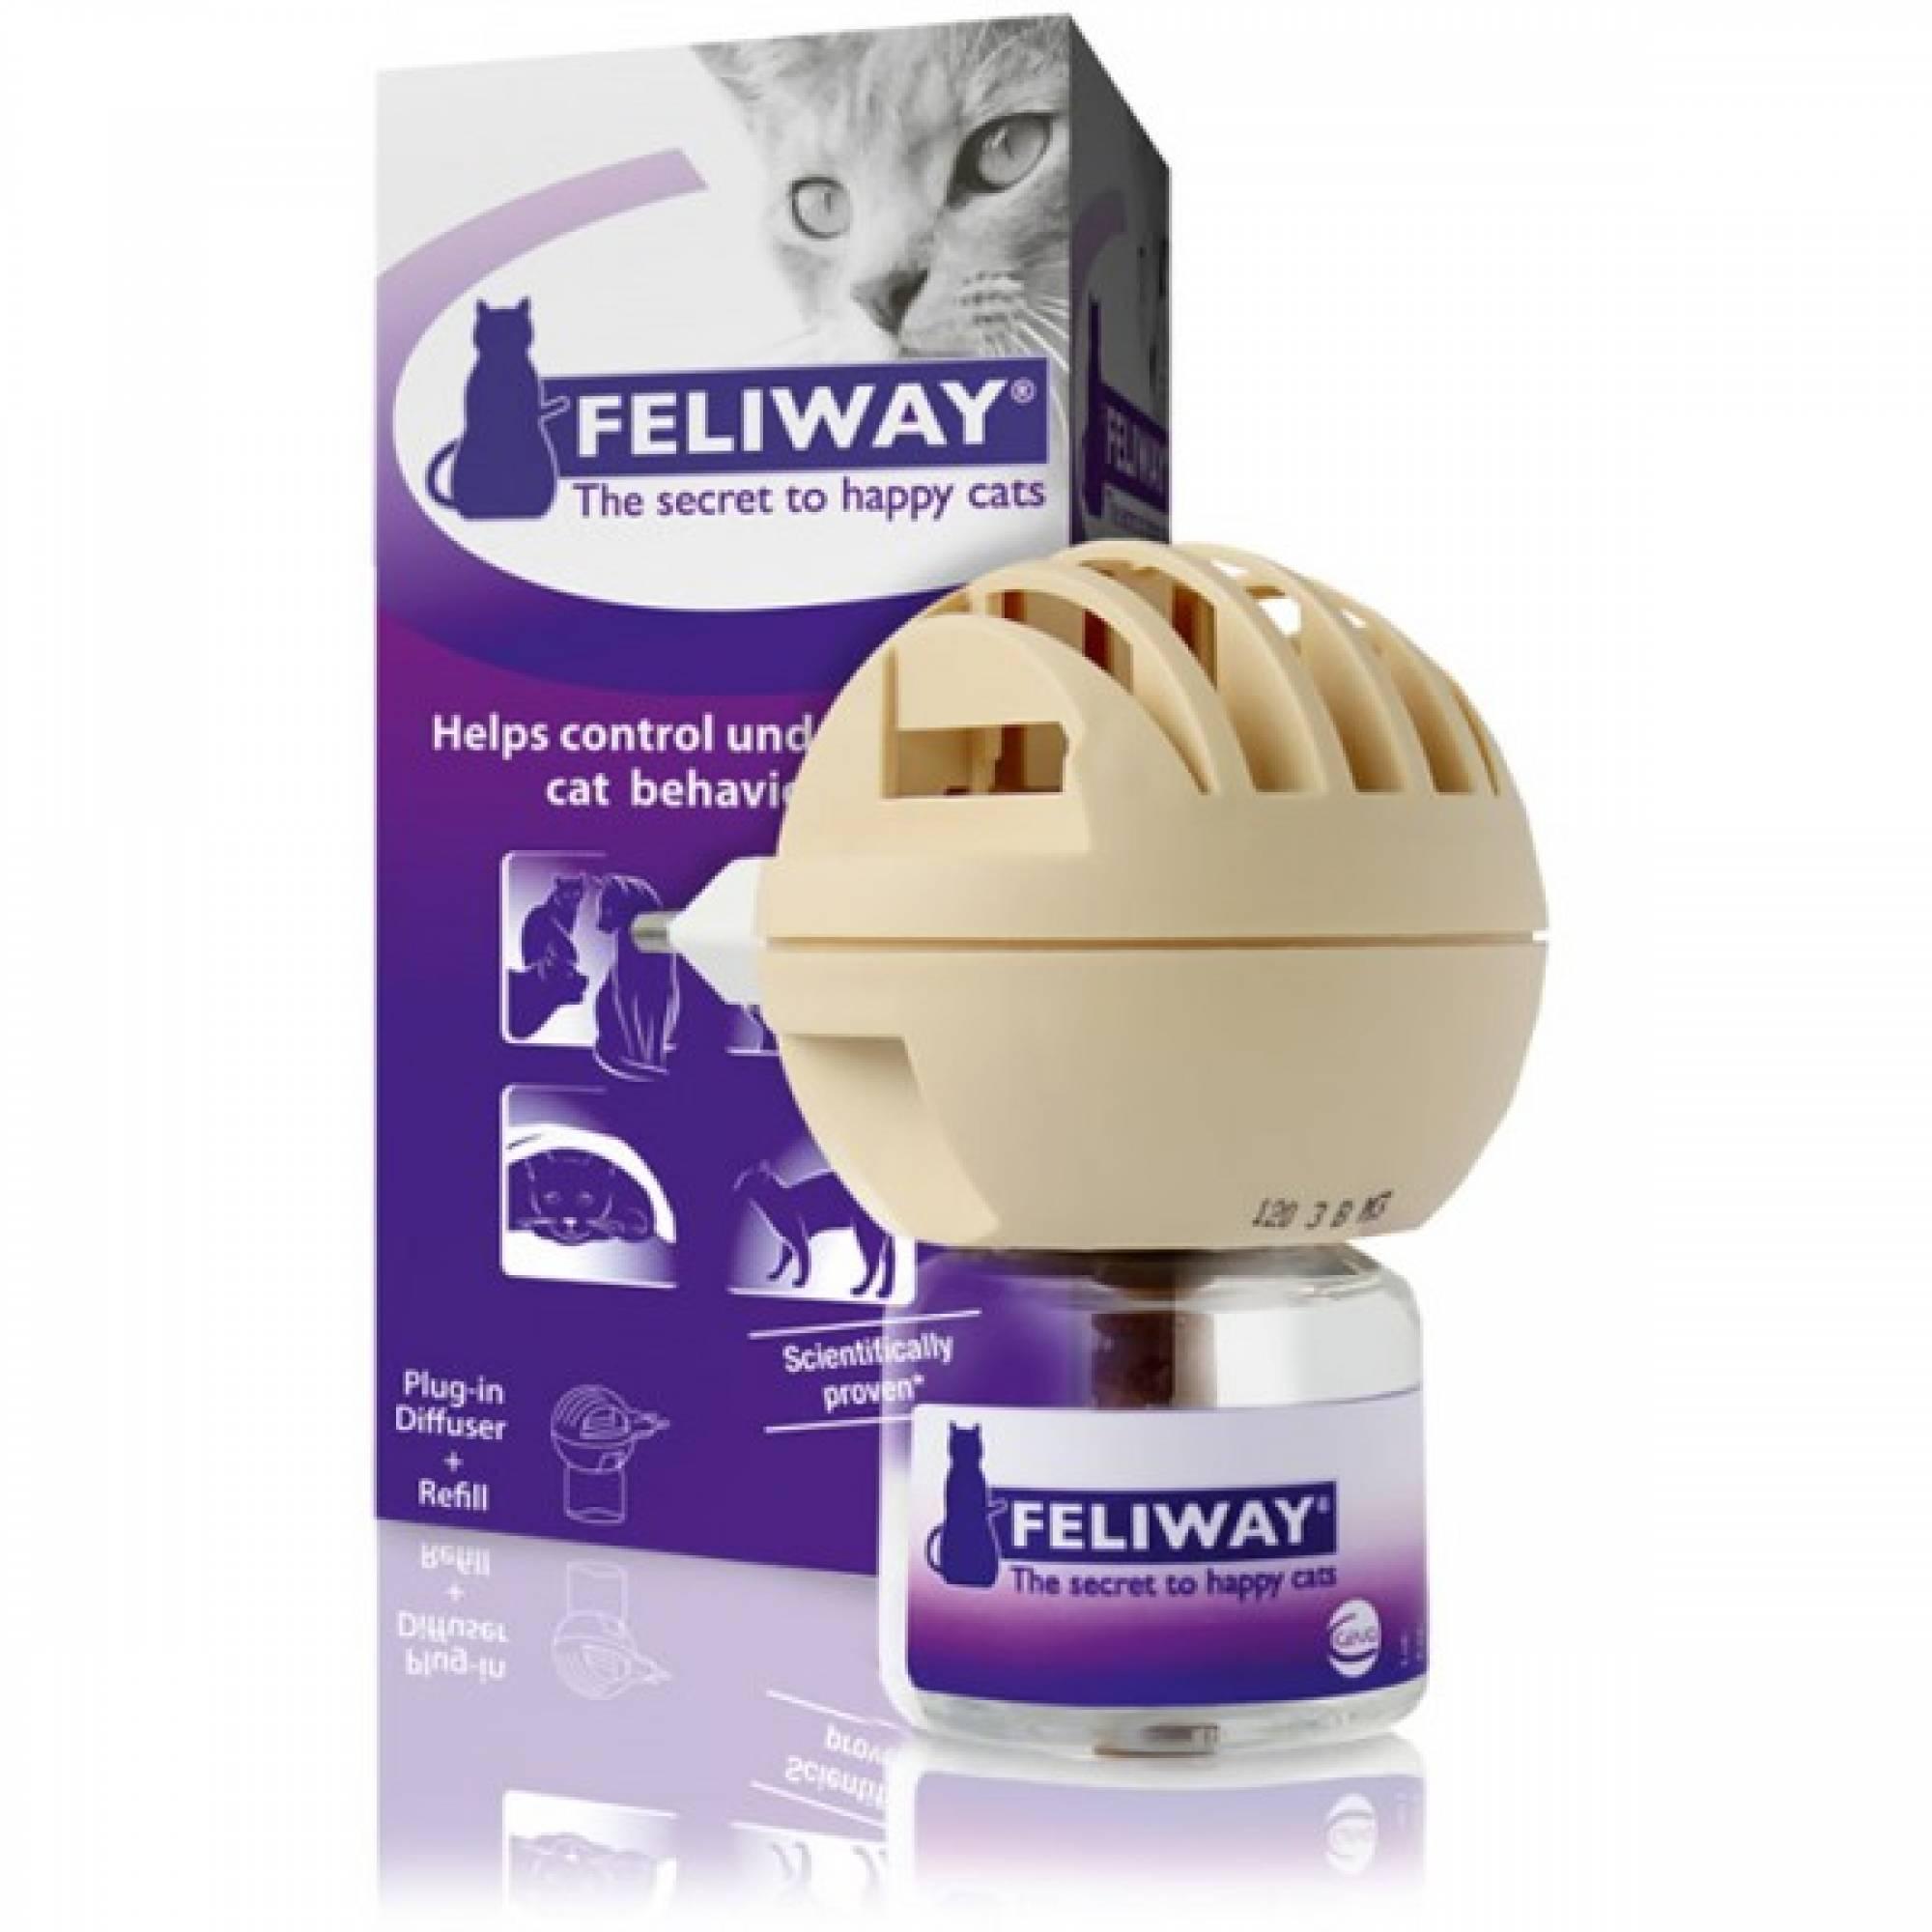 Feliway Electric Diffuser / Vial 48ml